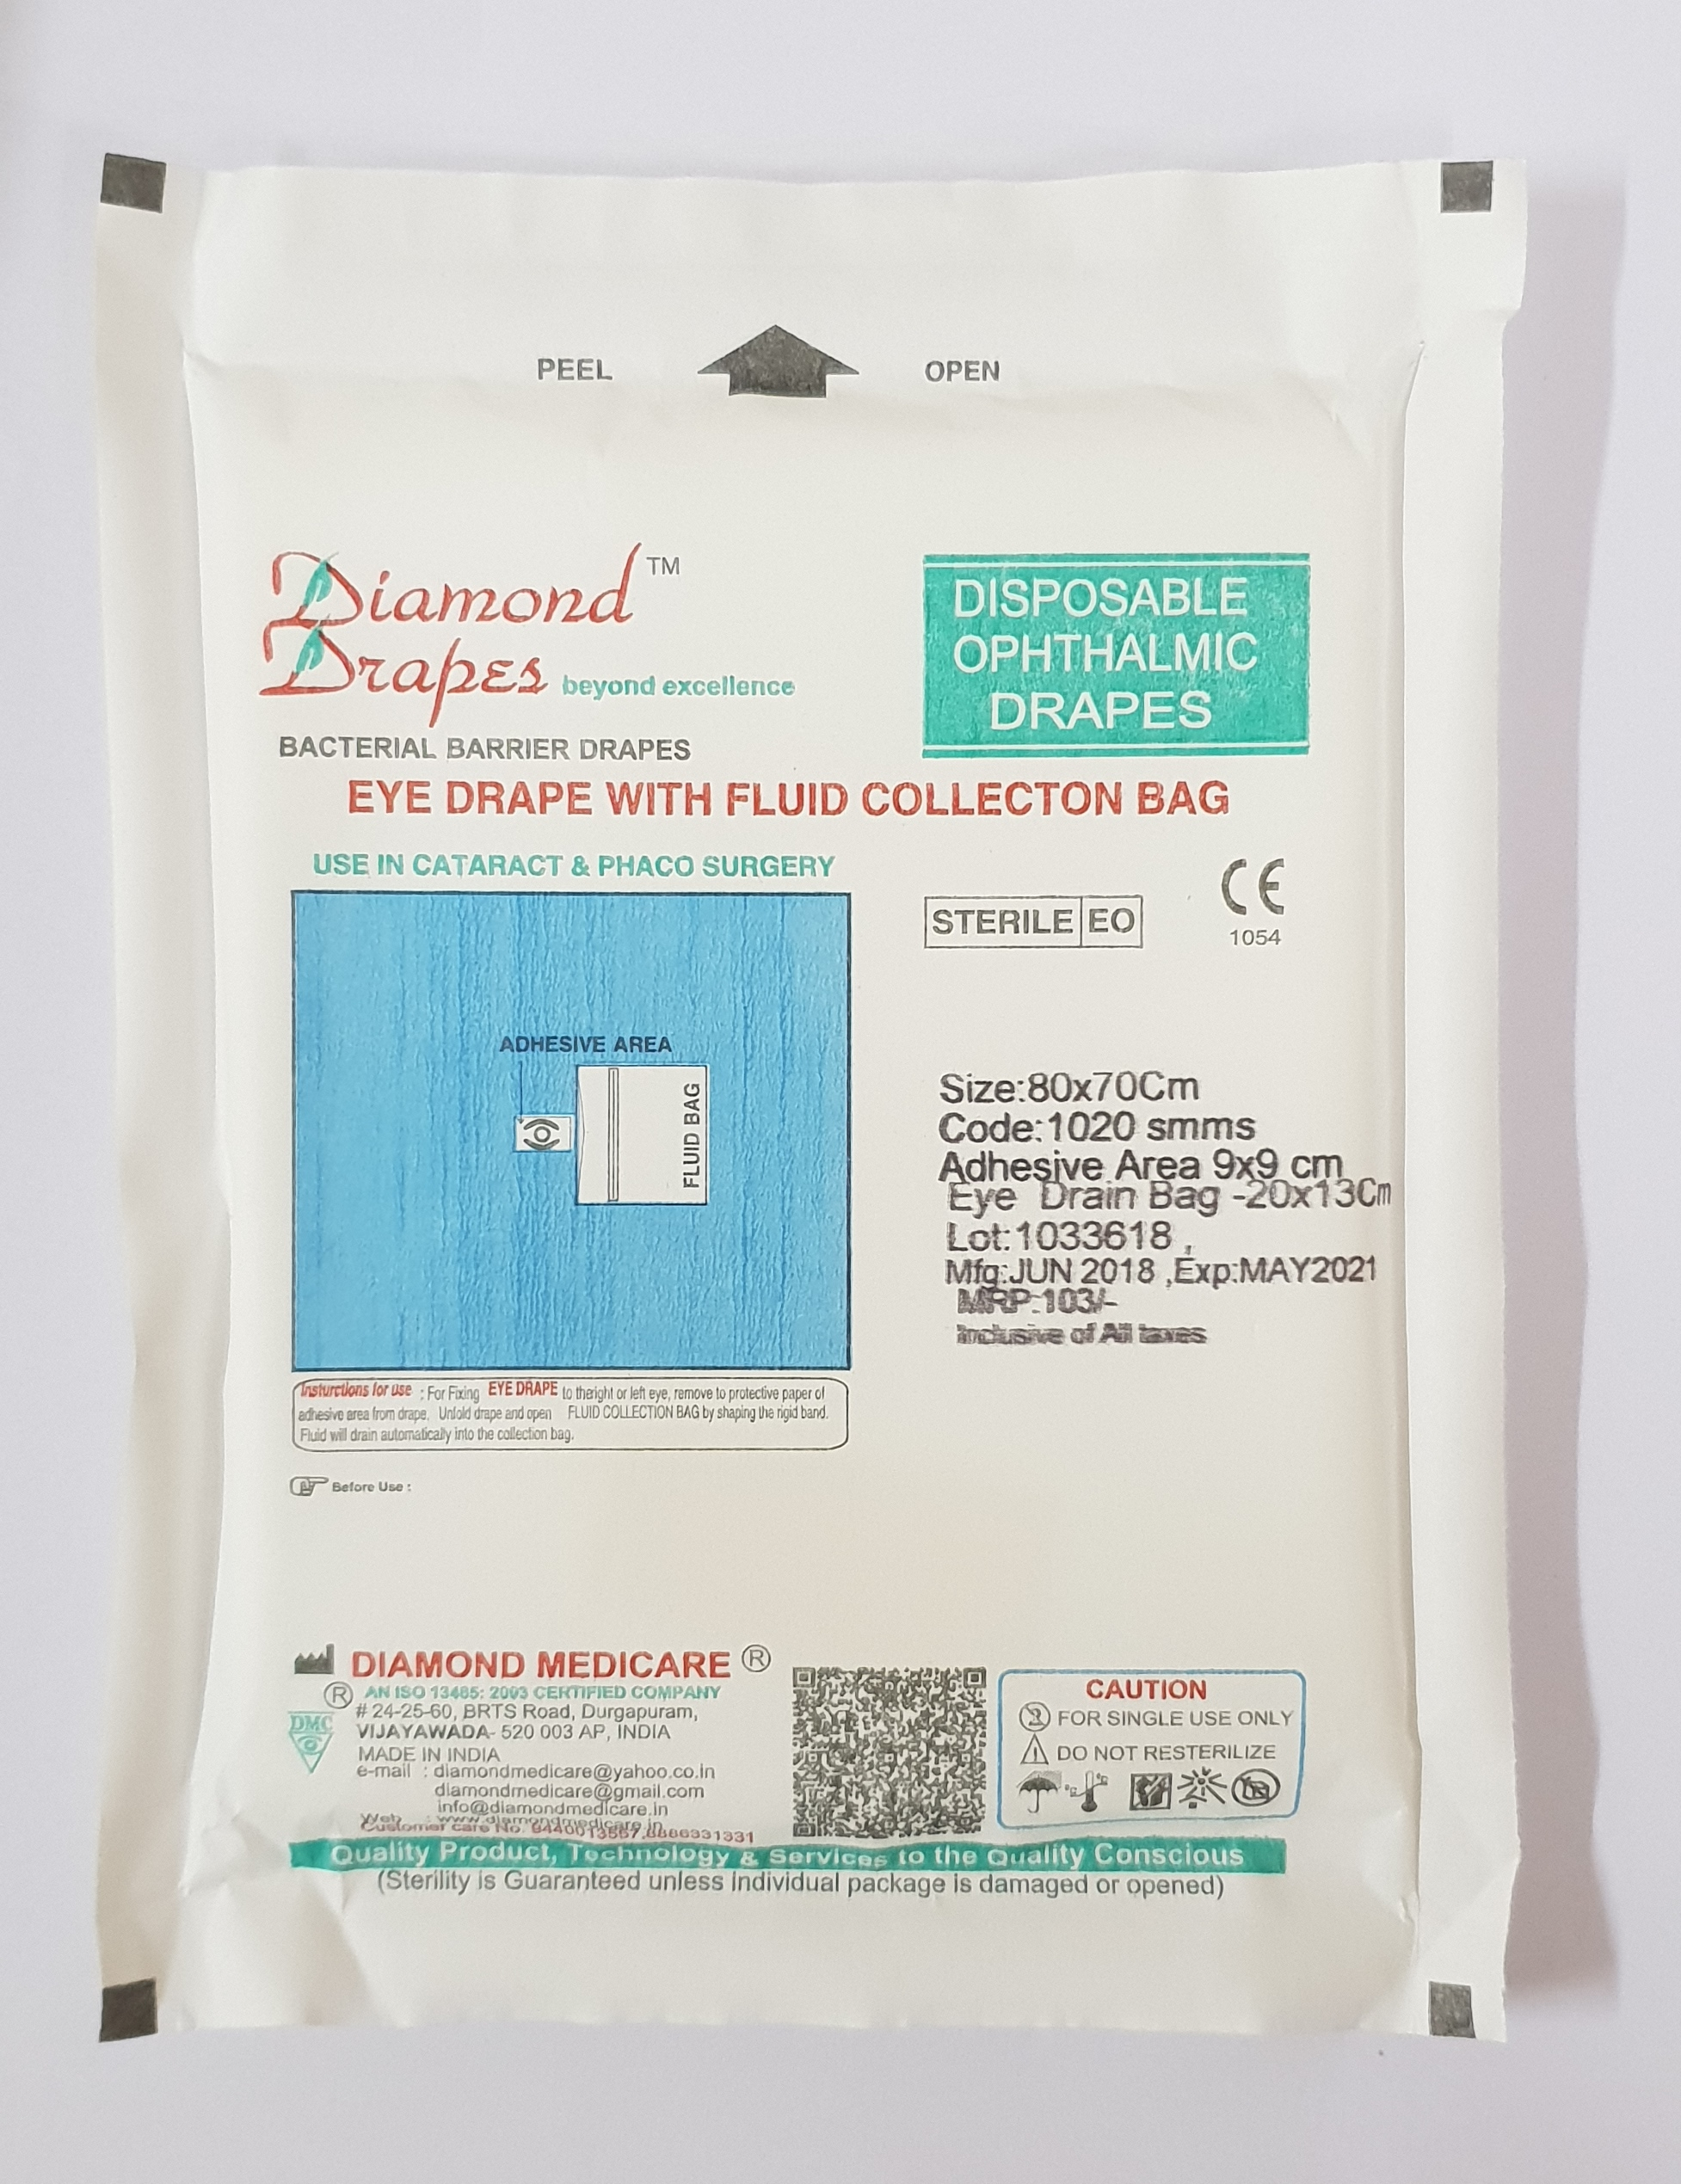 Ophthalmic Eye Drape with Fluid Bag